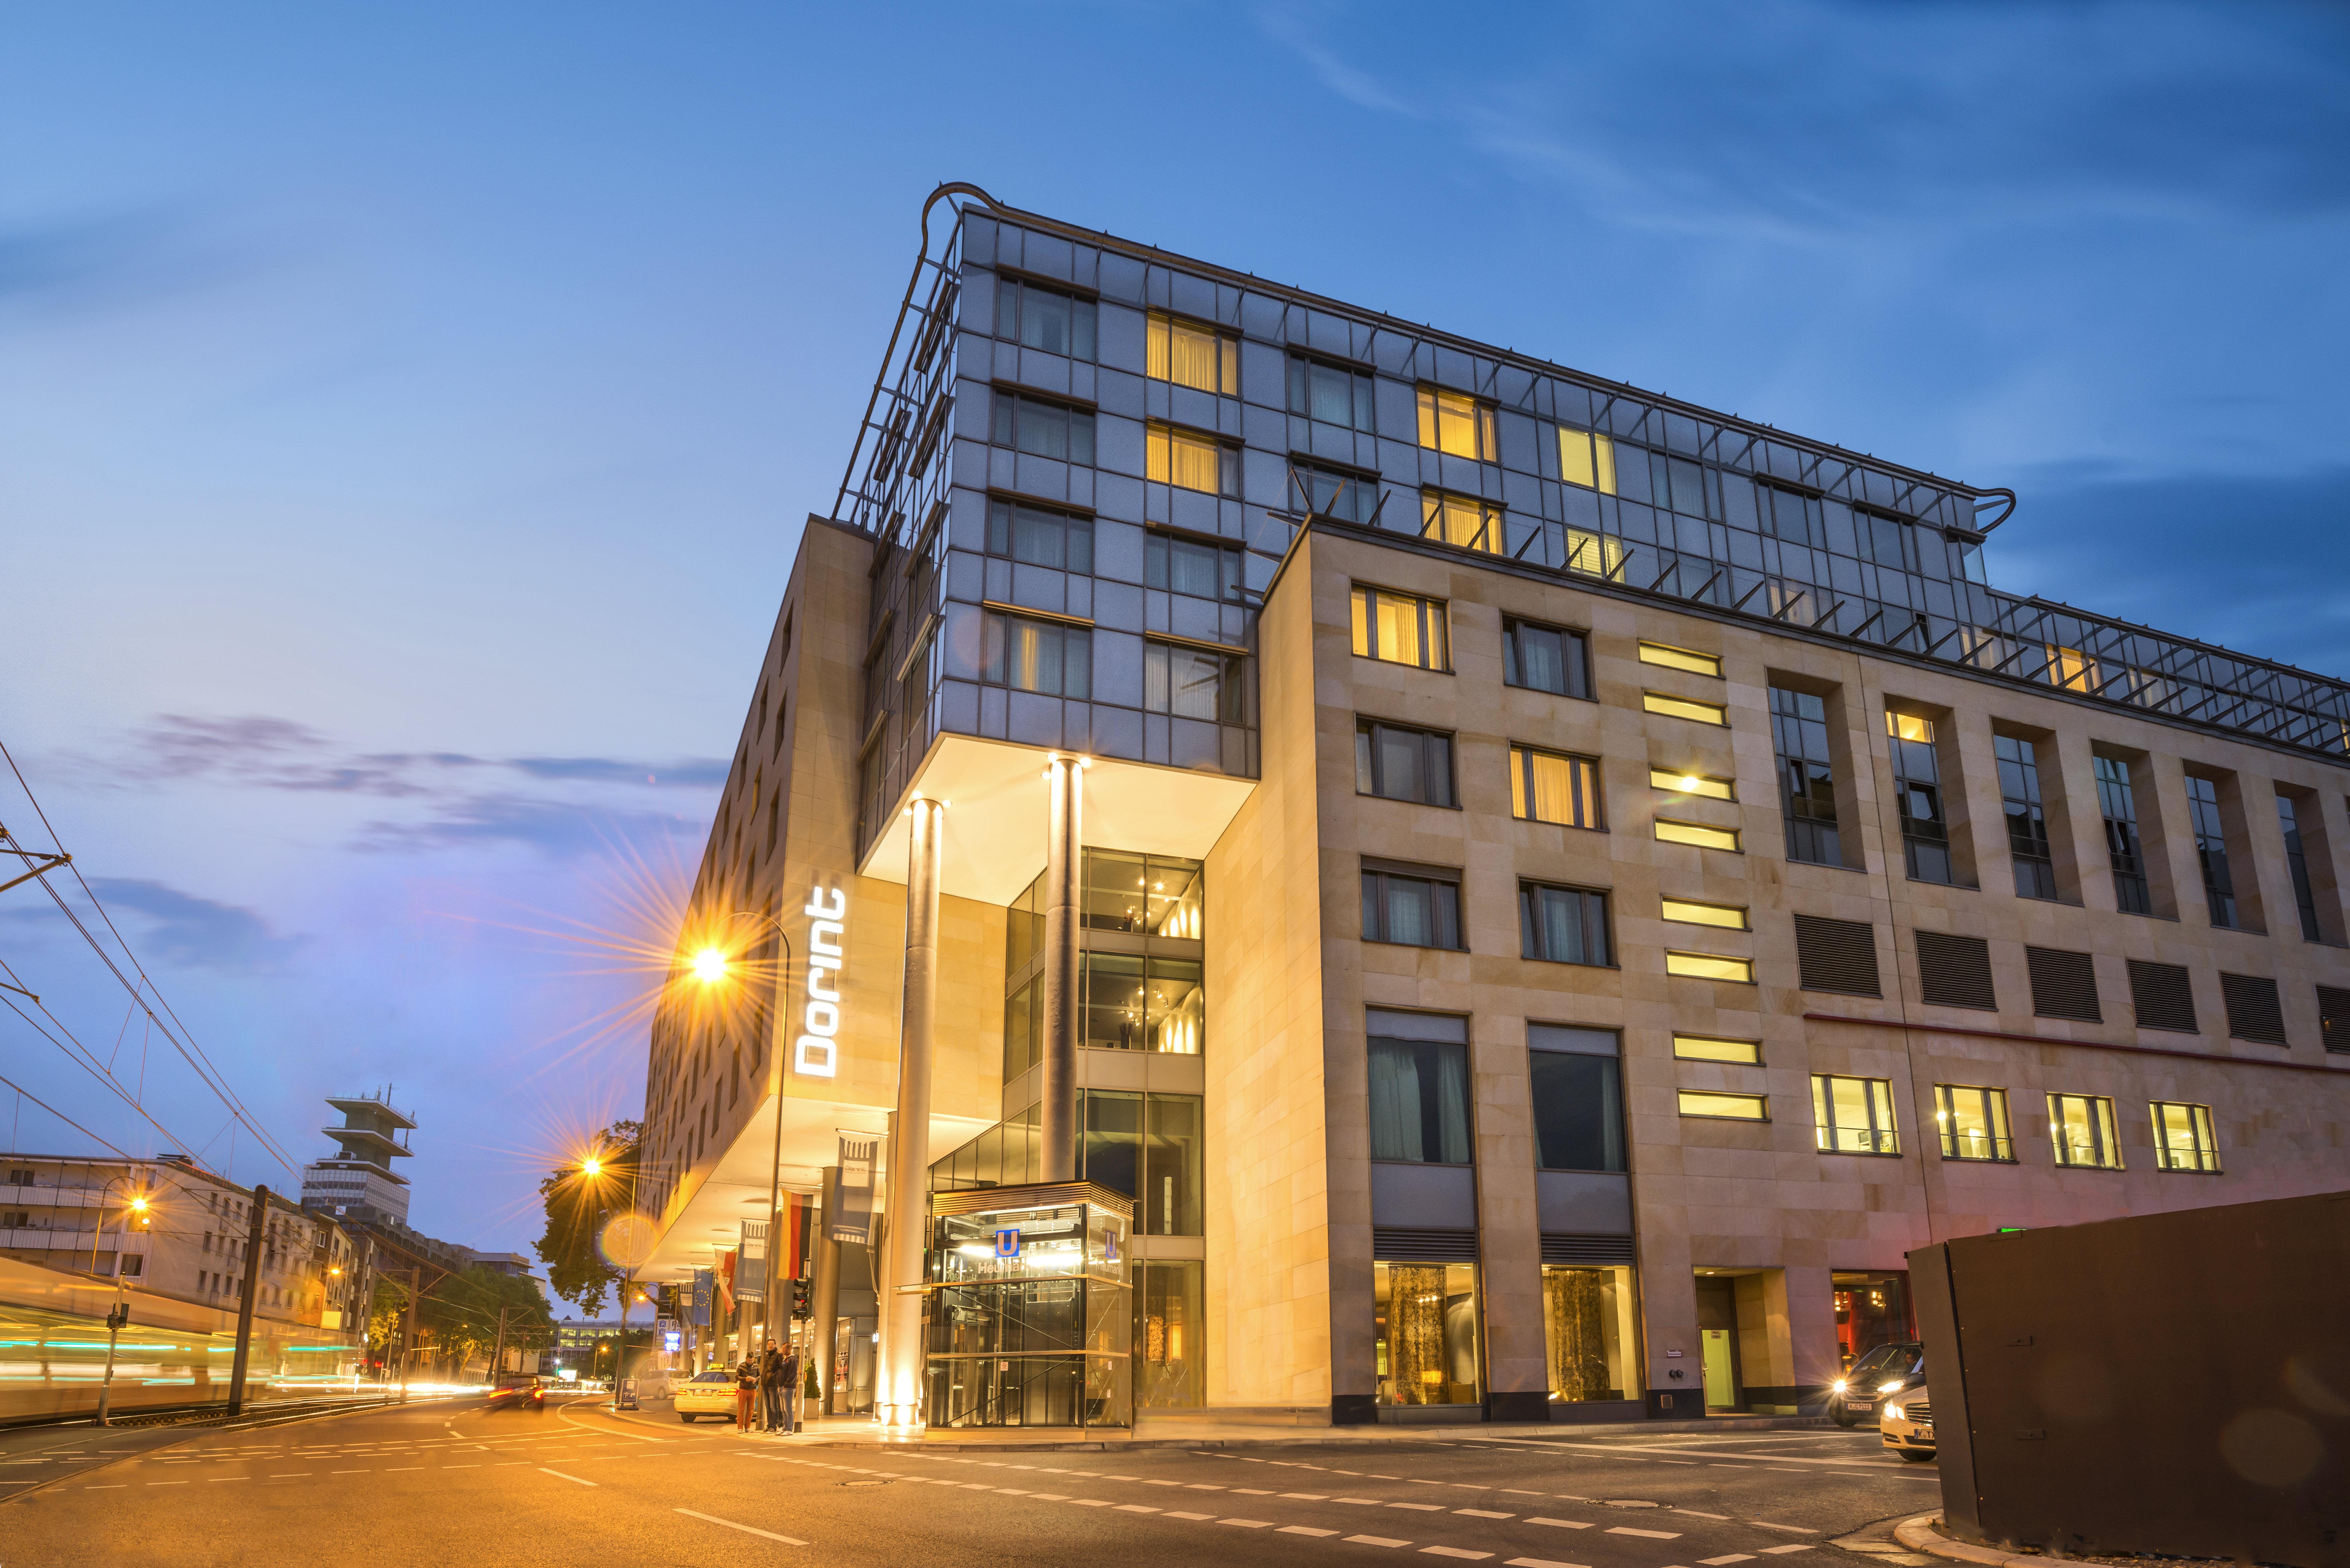 Günstige Hotels In Köln